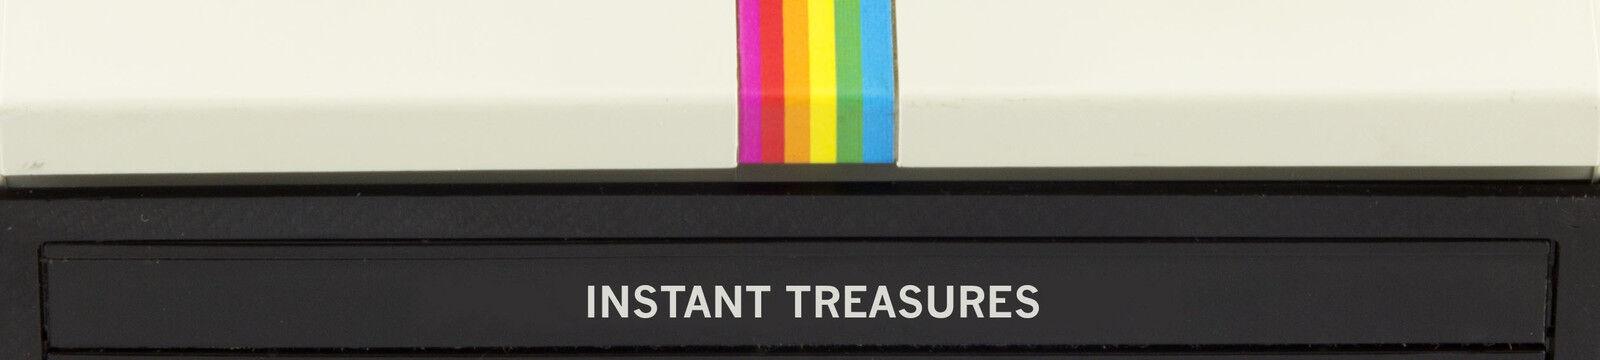 Instant Treasures